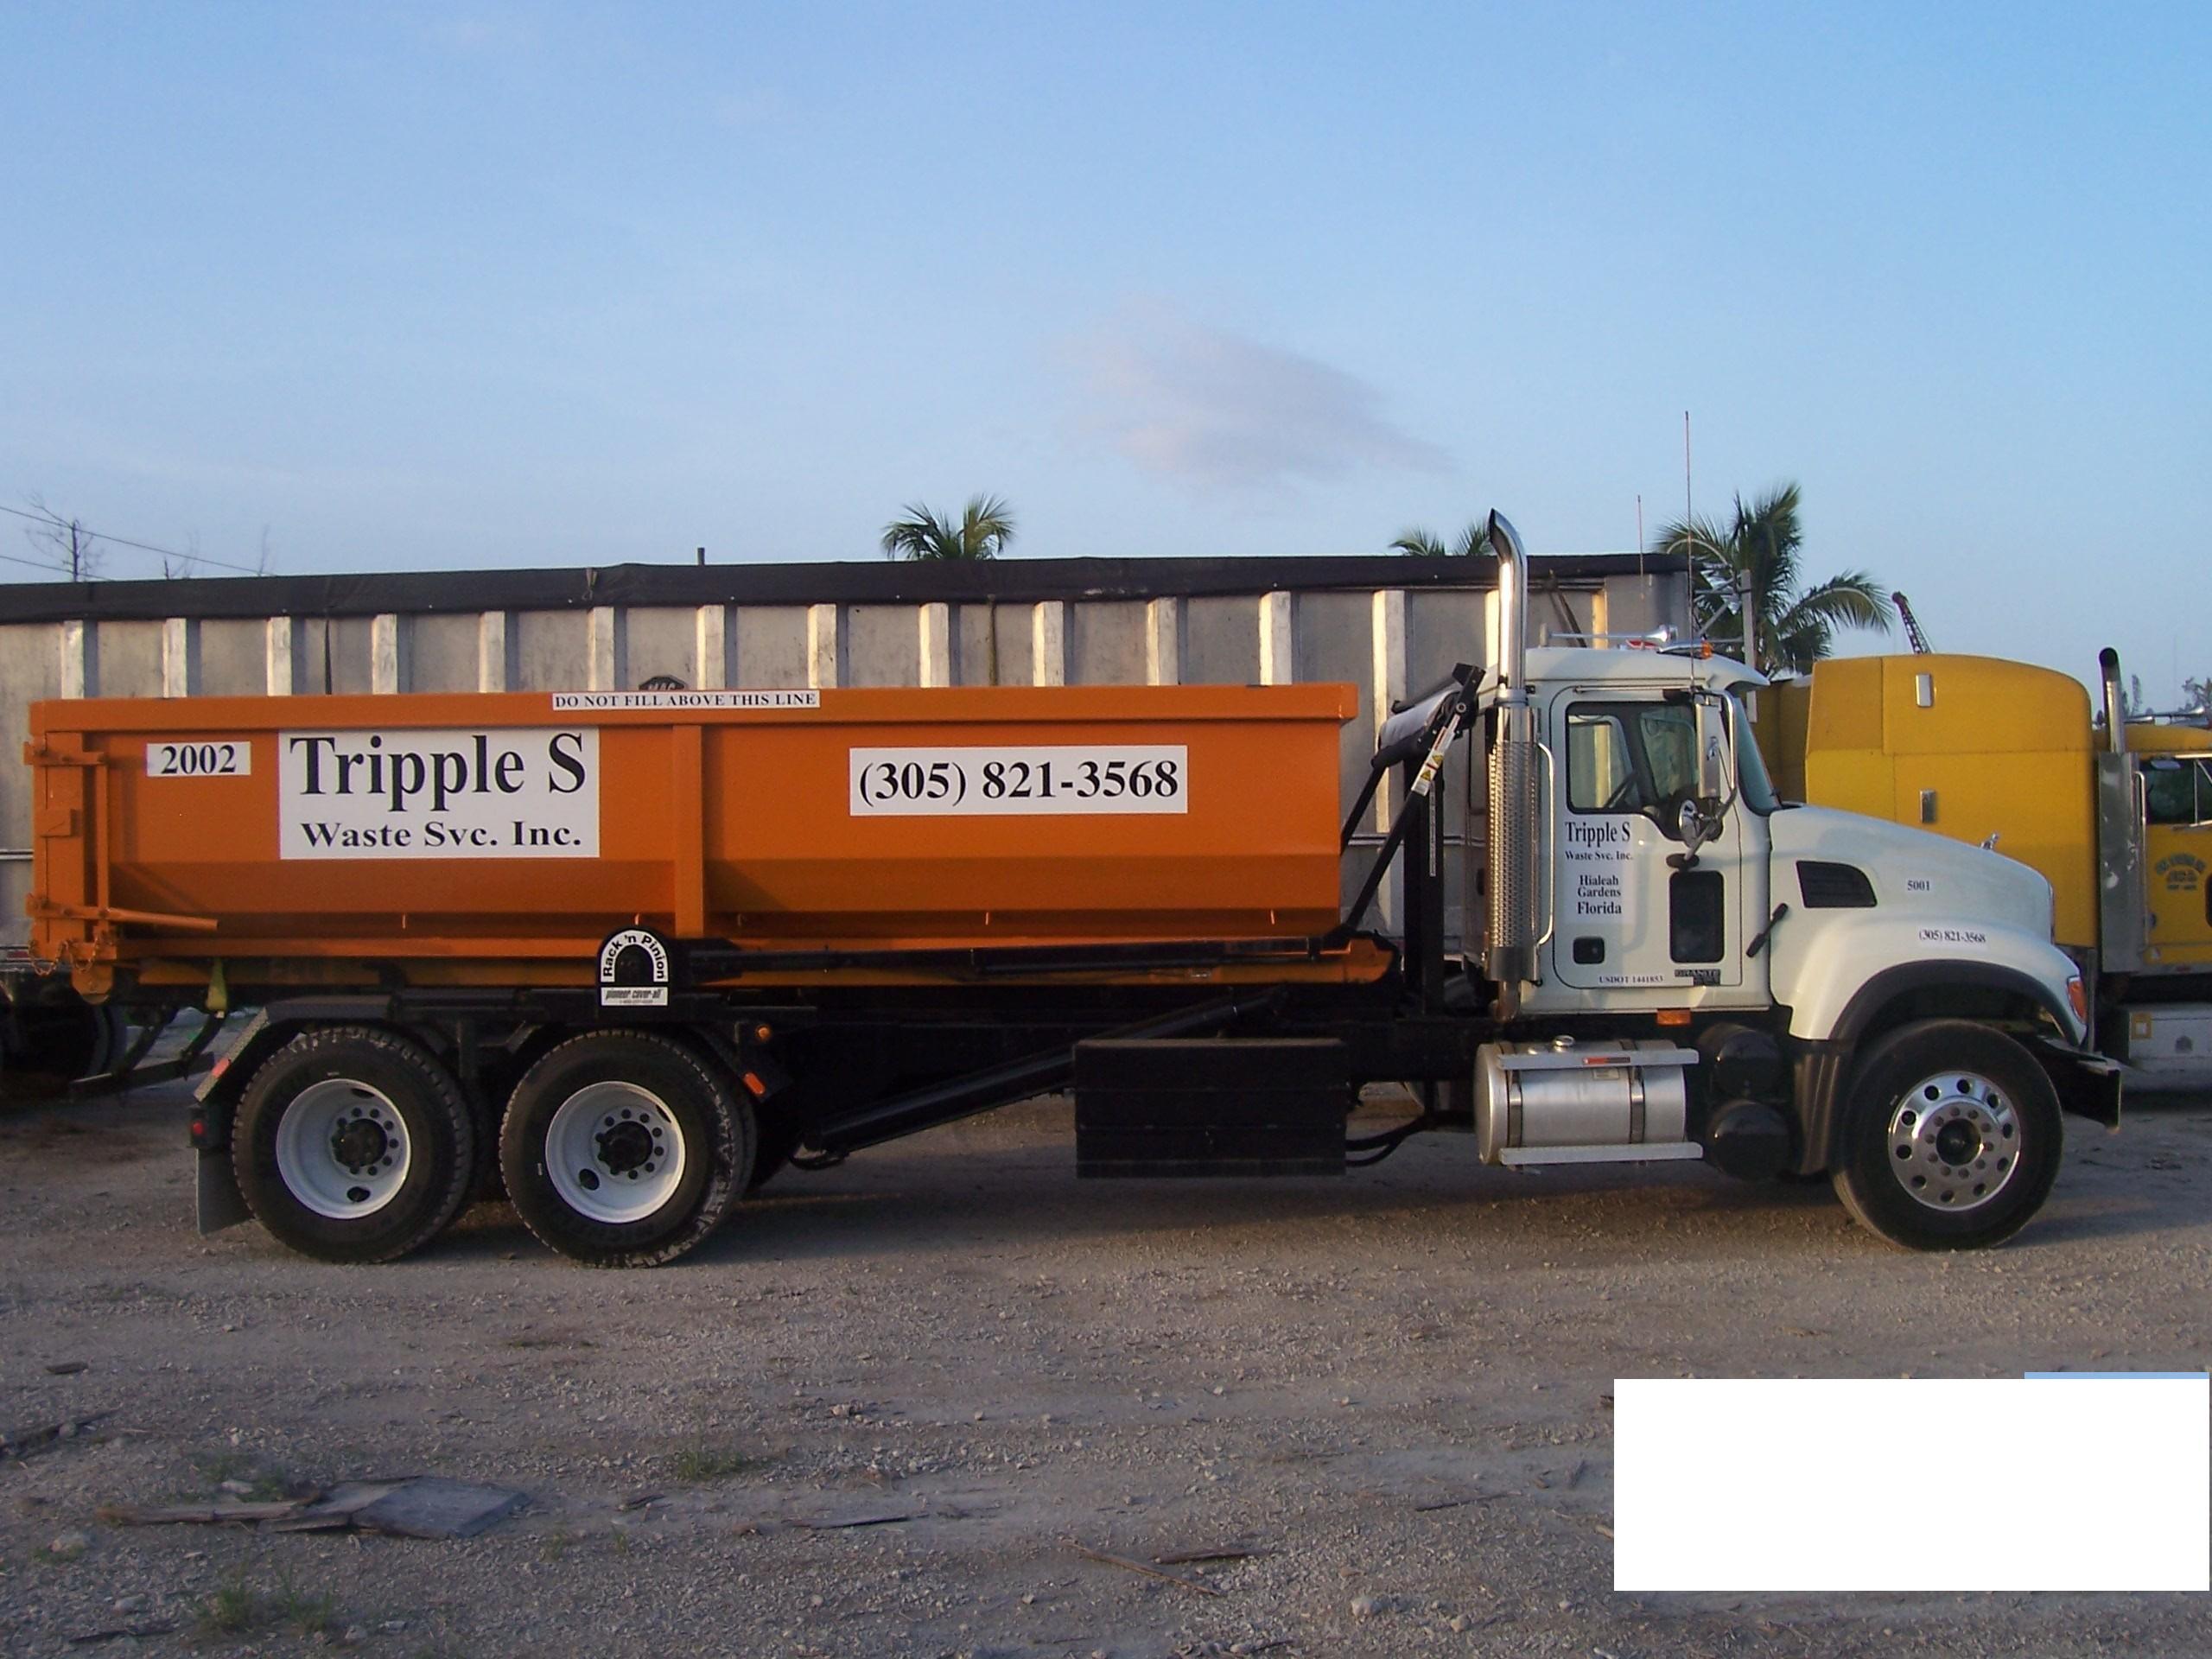 TRIPPLE S WASTE SERVICES INC